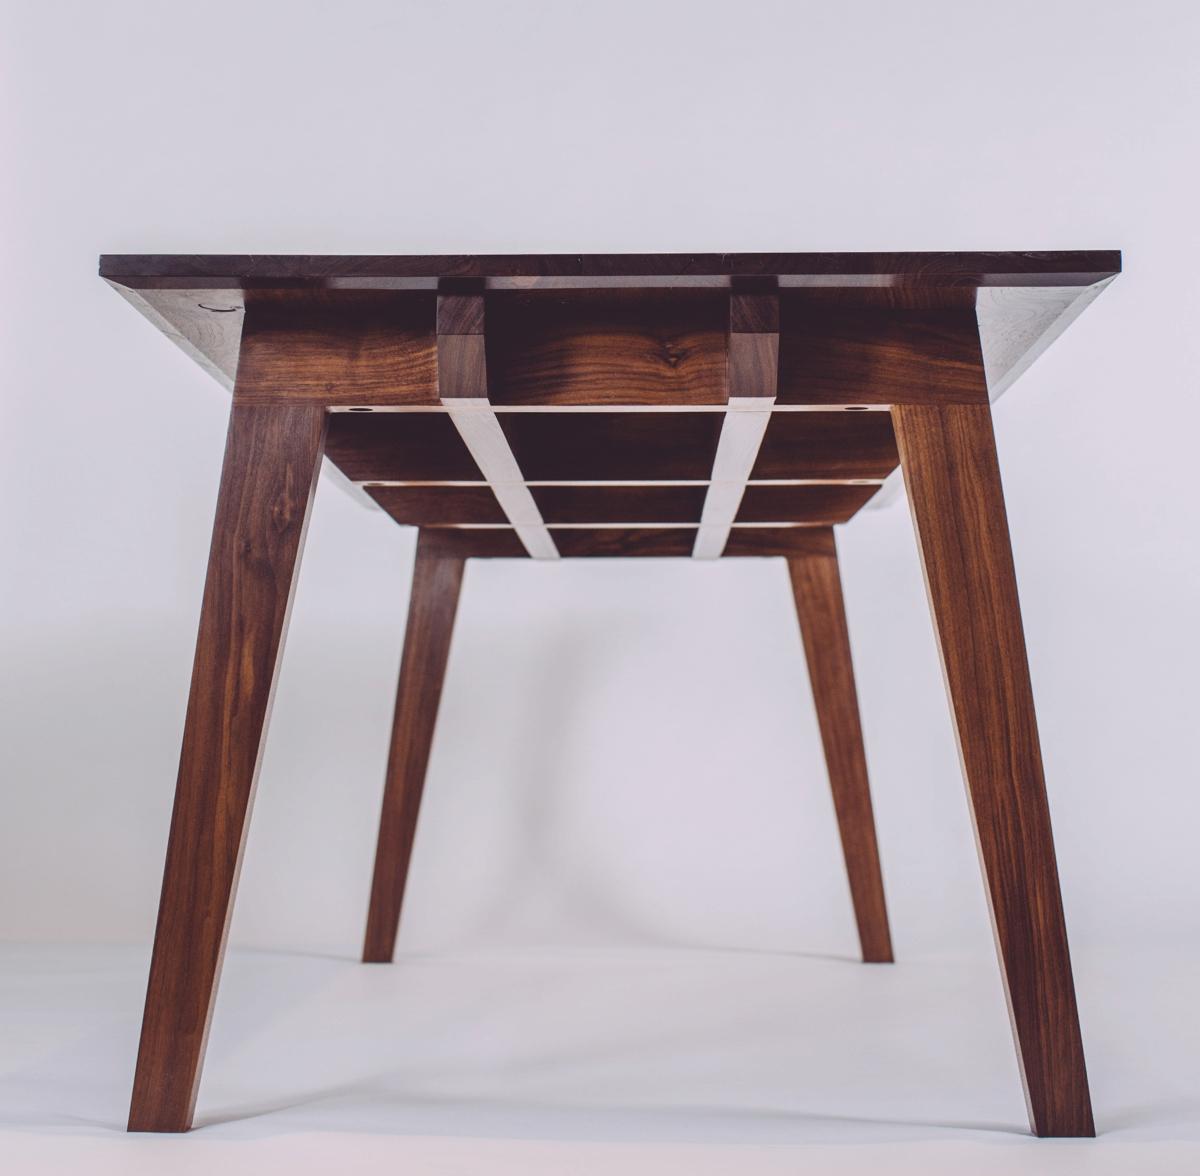 skana table_185204.jpg